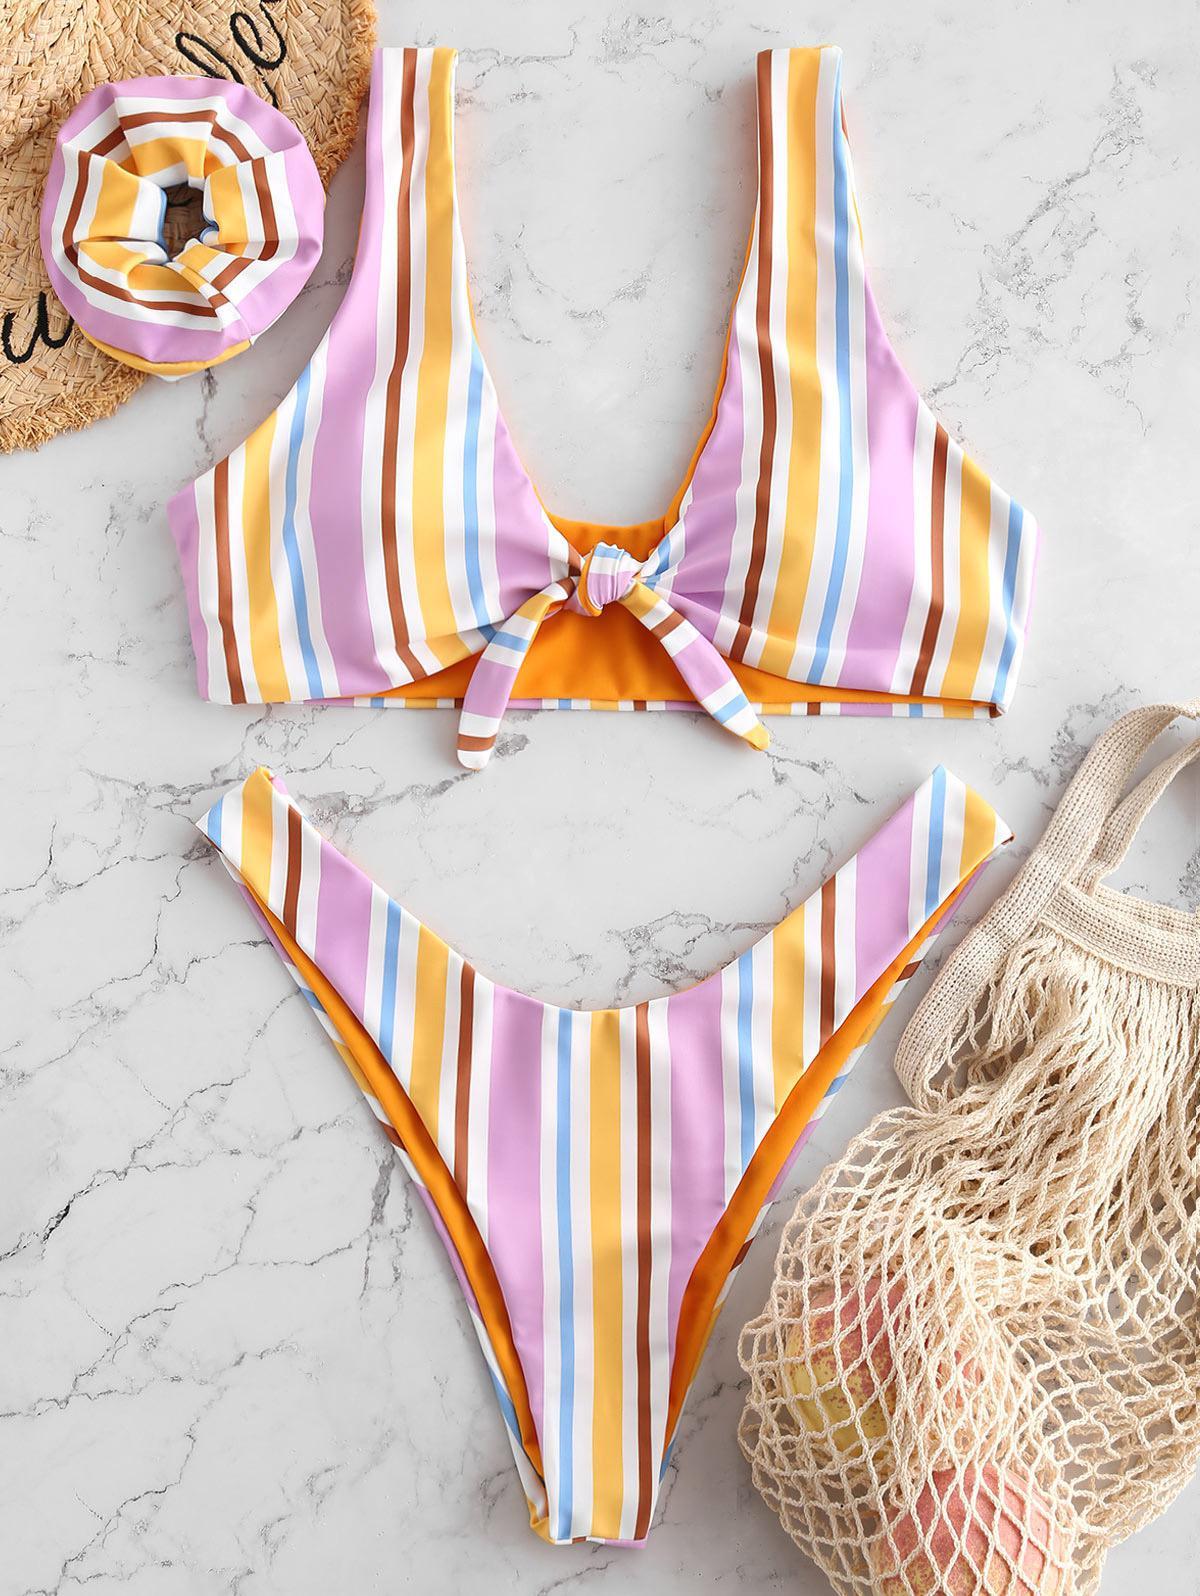 ZAFUL Colorful Striped Tied Plunging Bikini Set фото